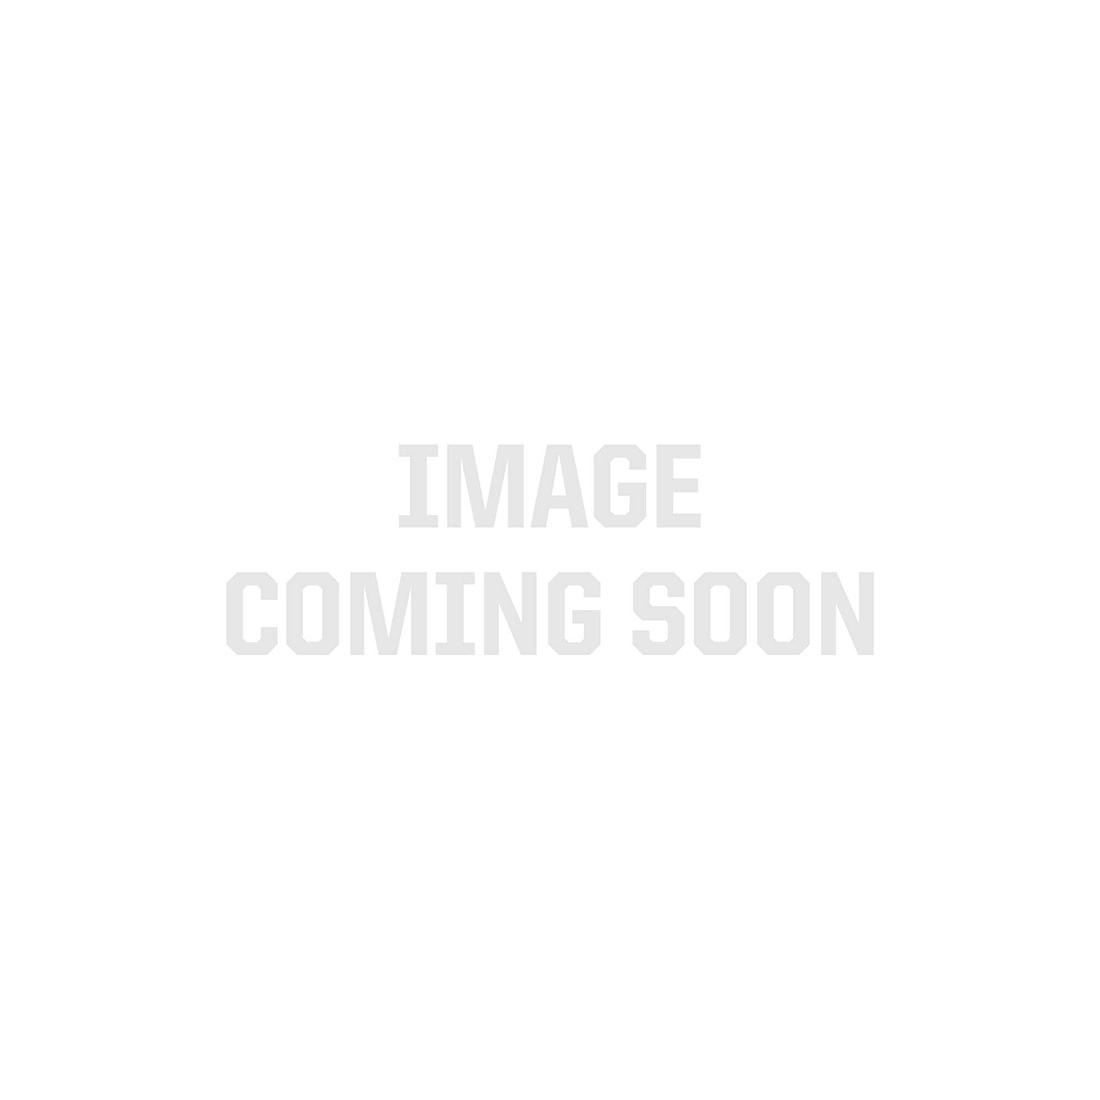 Amber 5050 LED Strip Light, 60/m, 10mm wide, Sample Kit